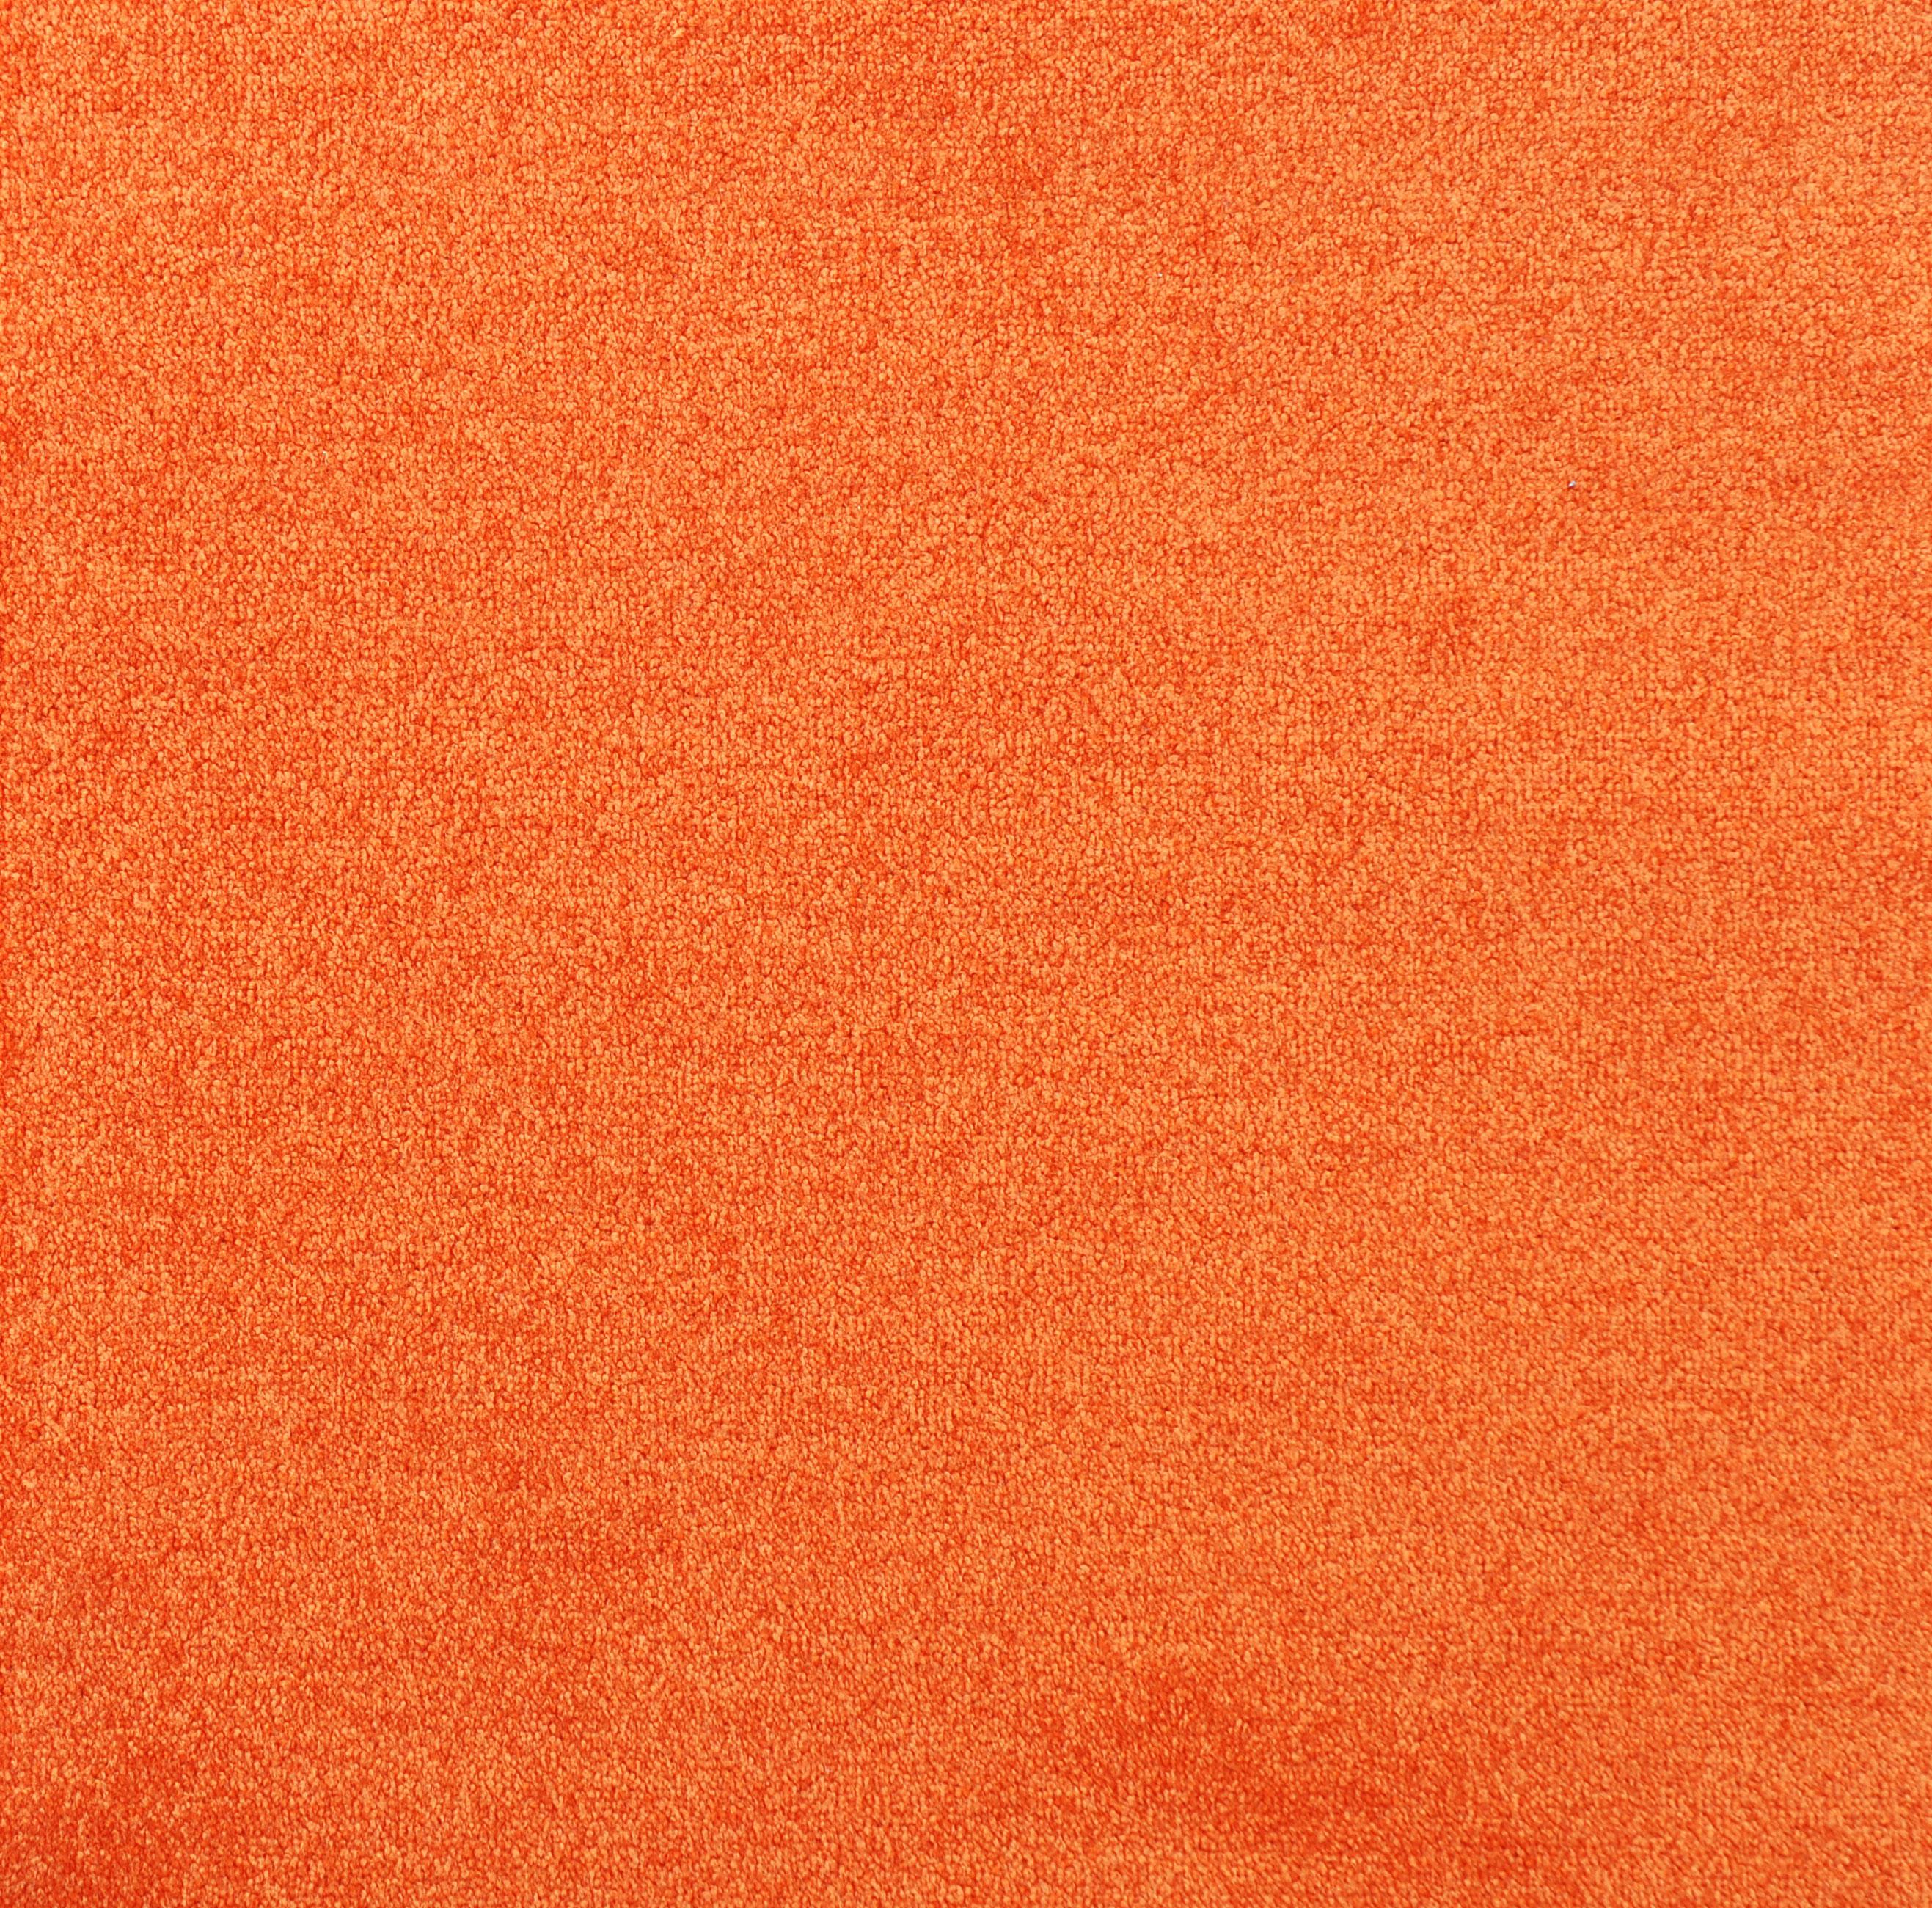 Maestro Chanteney Orange Carpet Tiles Paragon Carpets